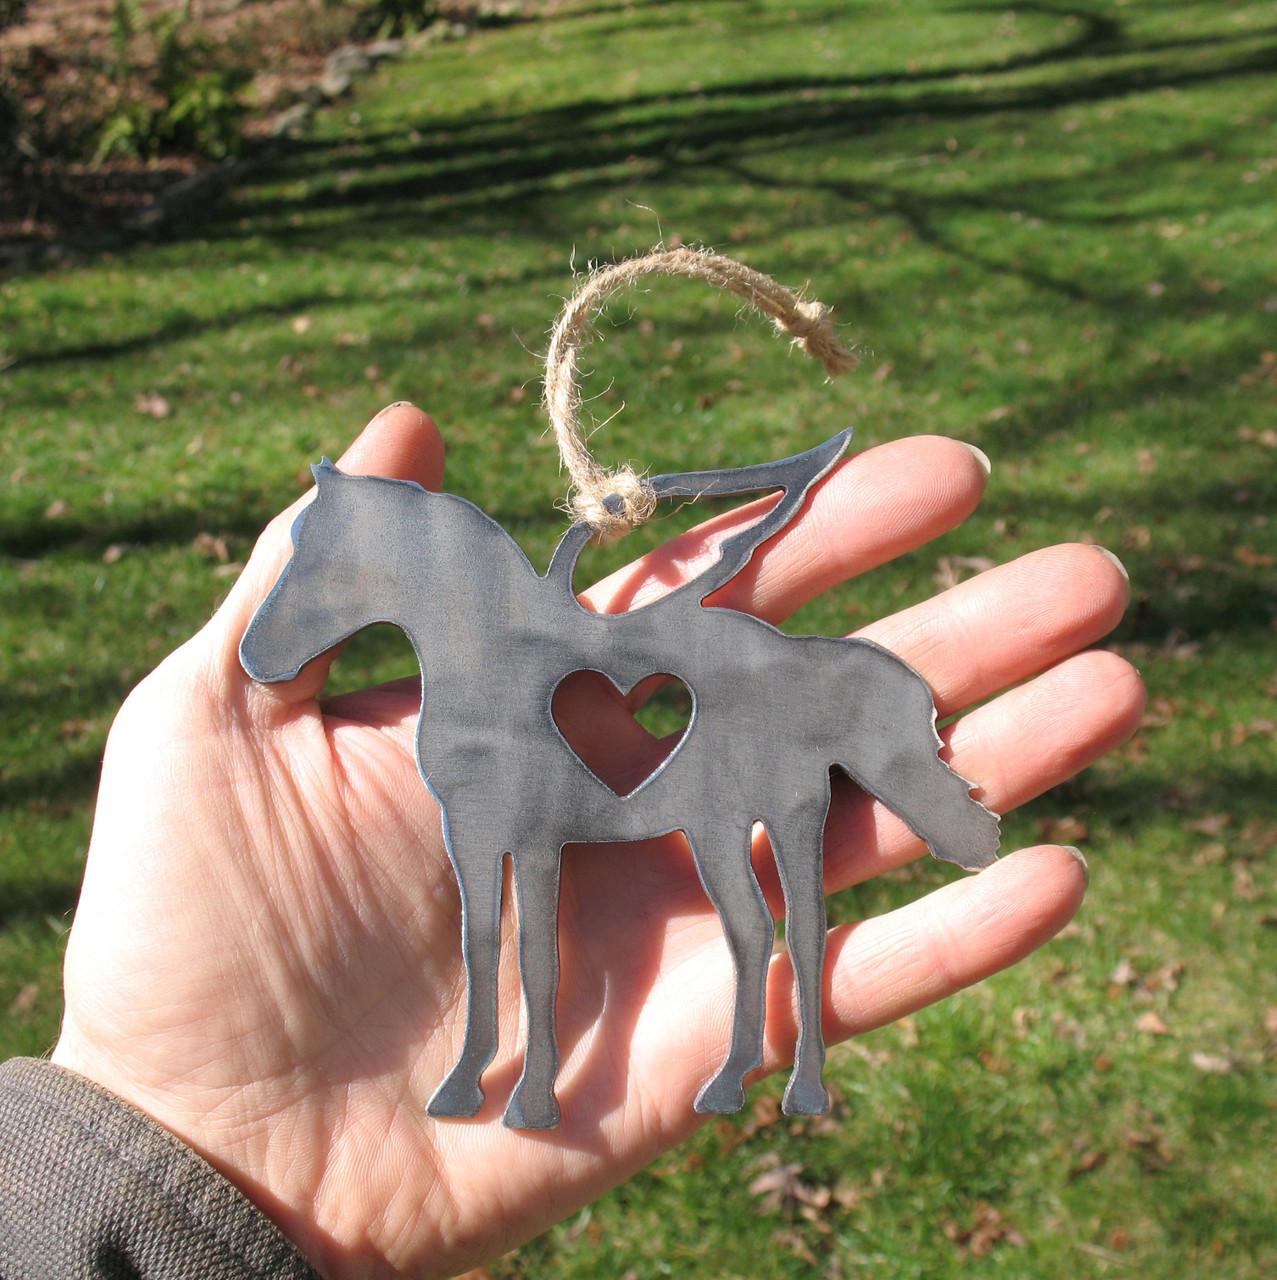 Horse Ornament Pet Memorial W/ Angel Wings - Pet Loss Sympathy Remembrance Gift - Metal Horse Christmas Ornament